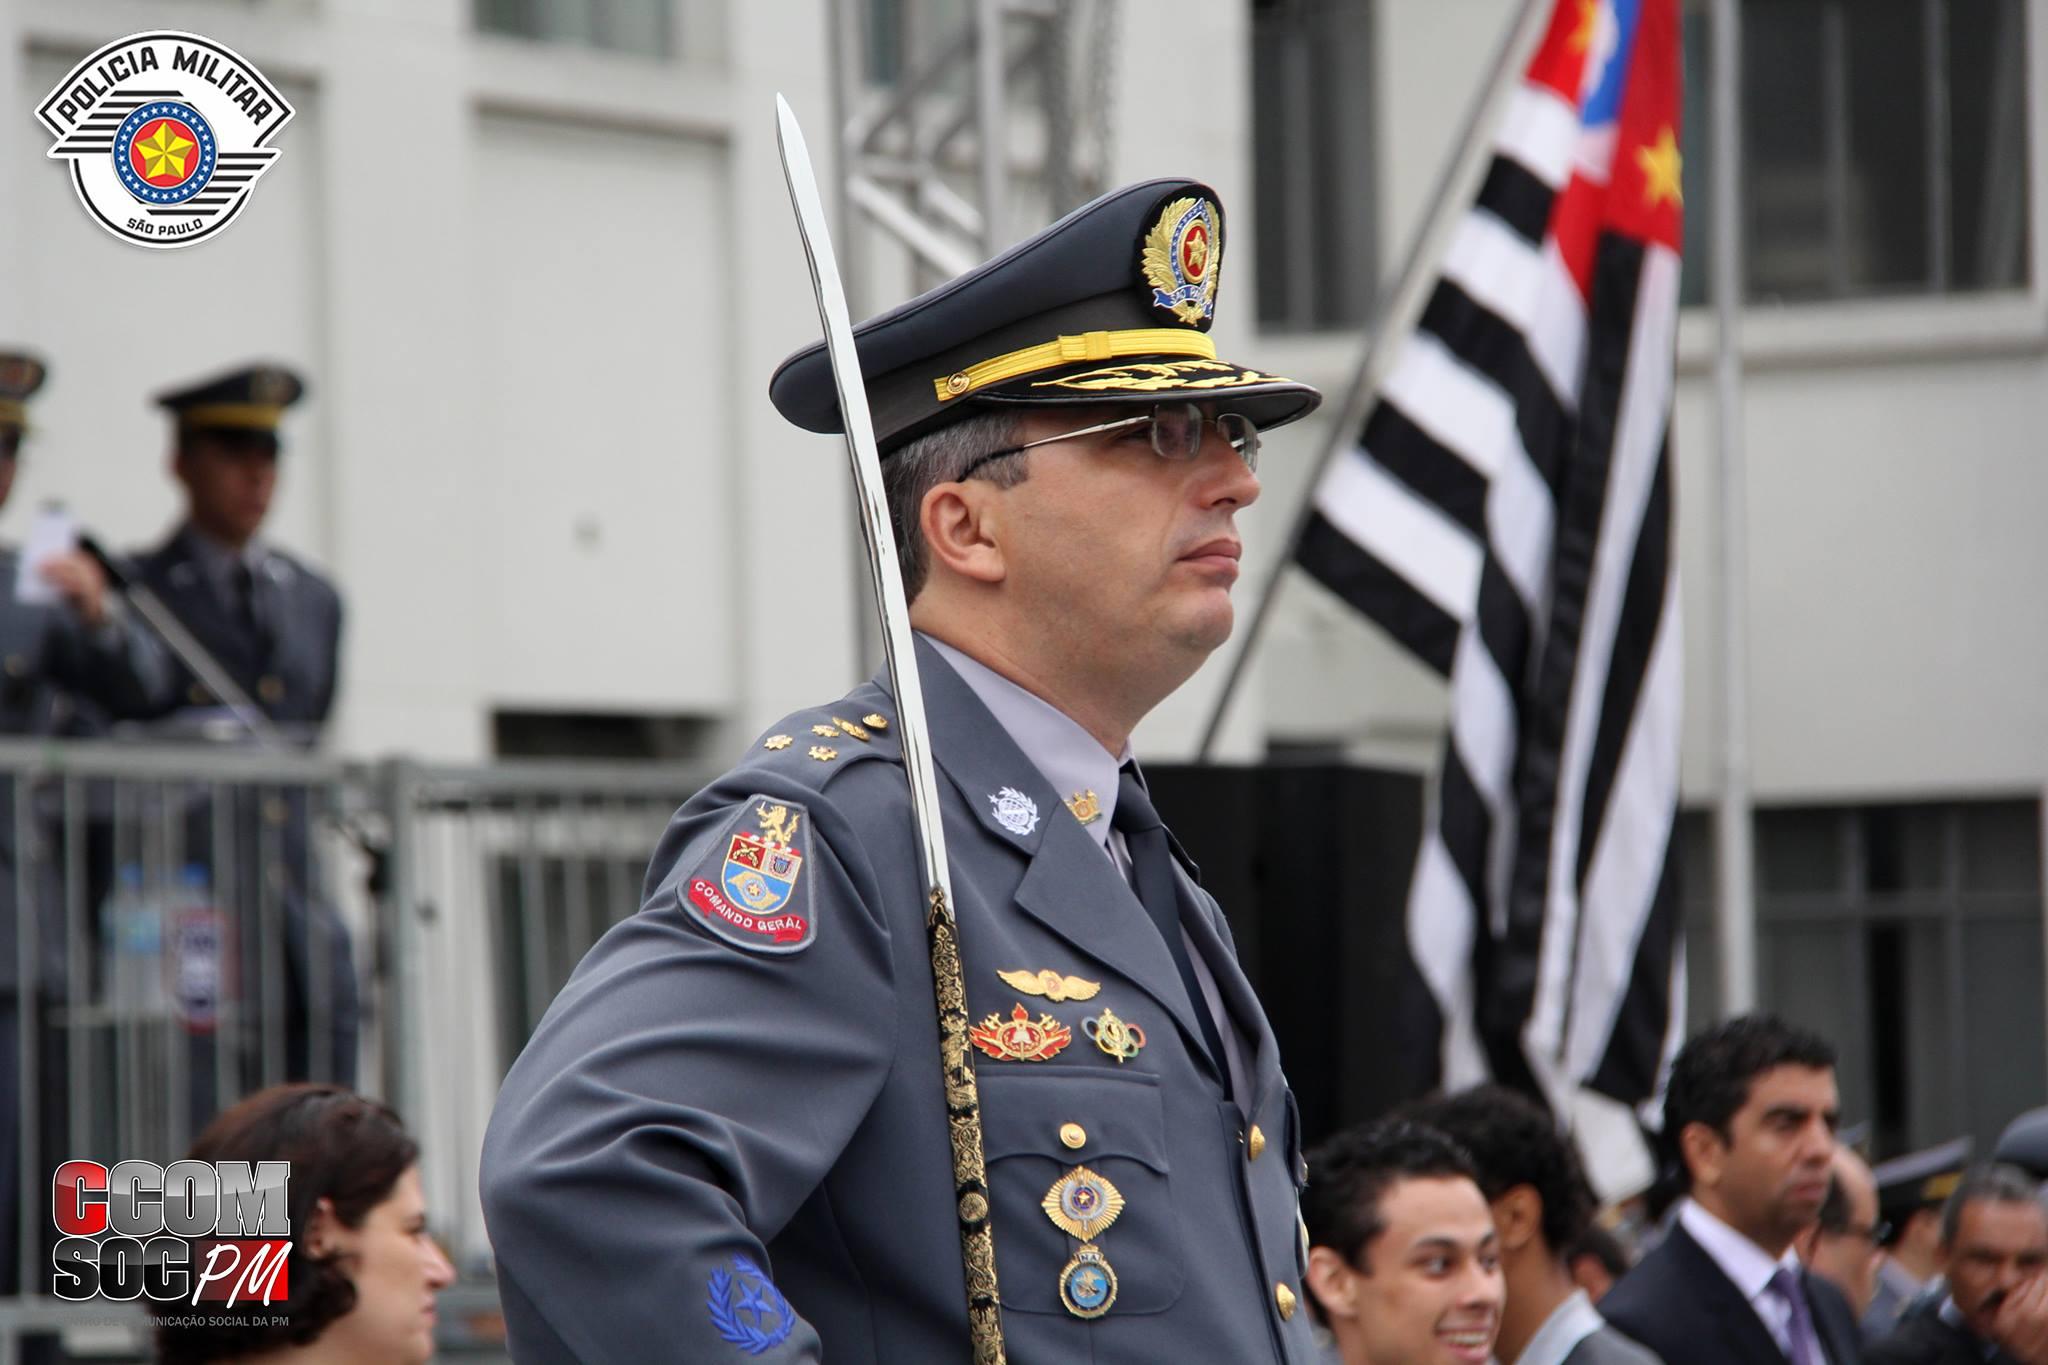 Foto 1 PMESP-NovoComando.